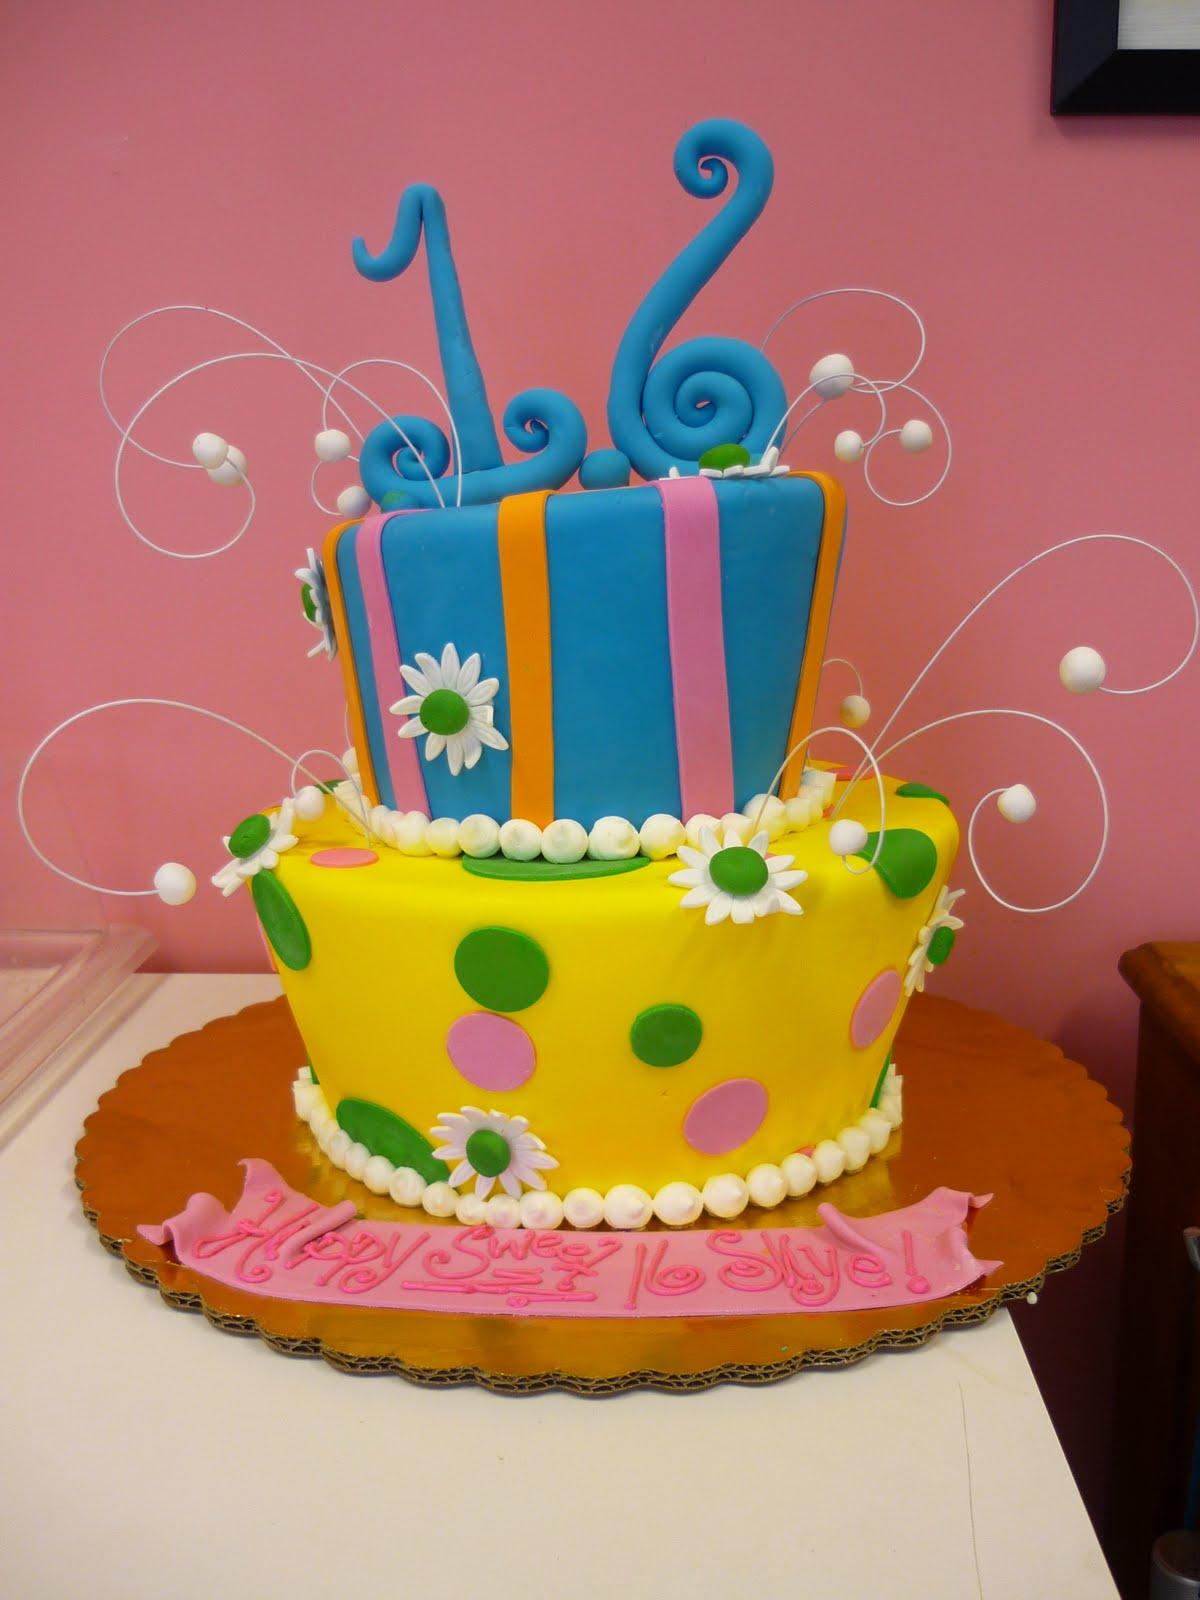 Funky sweet 16 birthday cakes